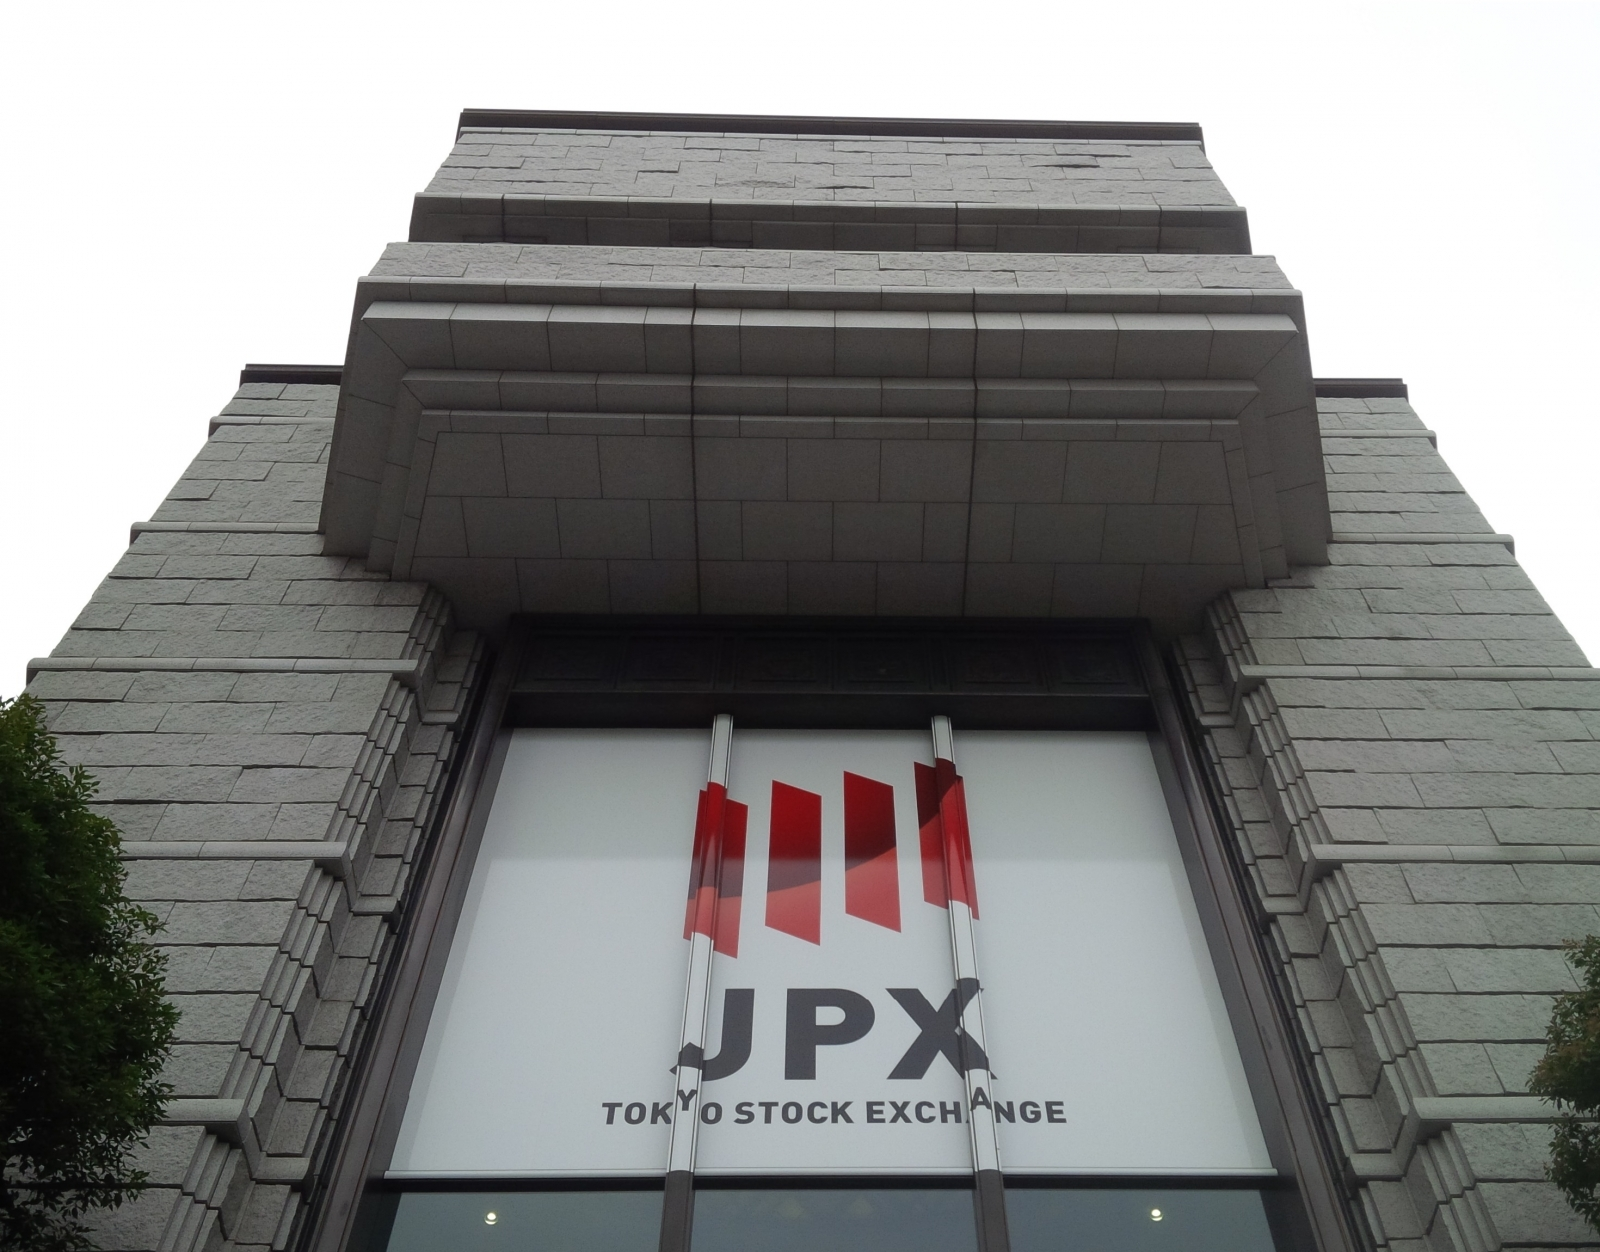 Japan Stock Exchange, Tokyo